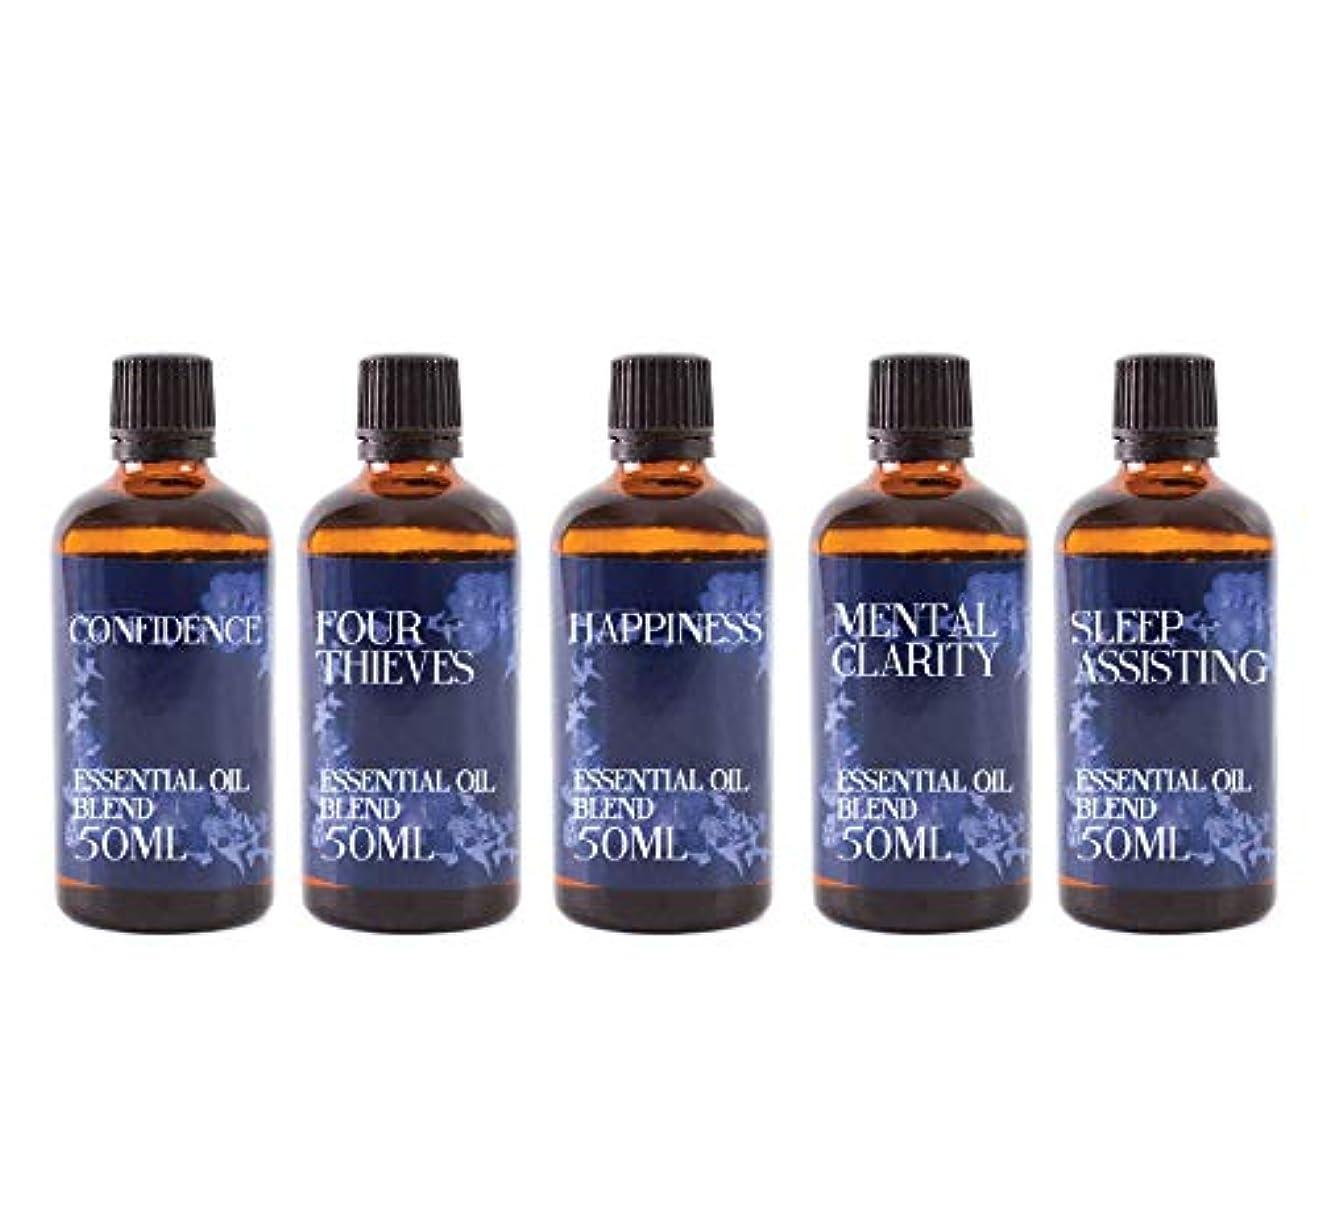 平均無能雇用者Mystix London | Gift Starter Pack of 5 x 50ml - Everyday Essentials - Essential Oil Blends